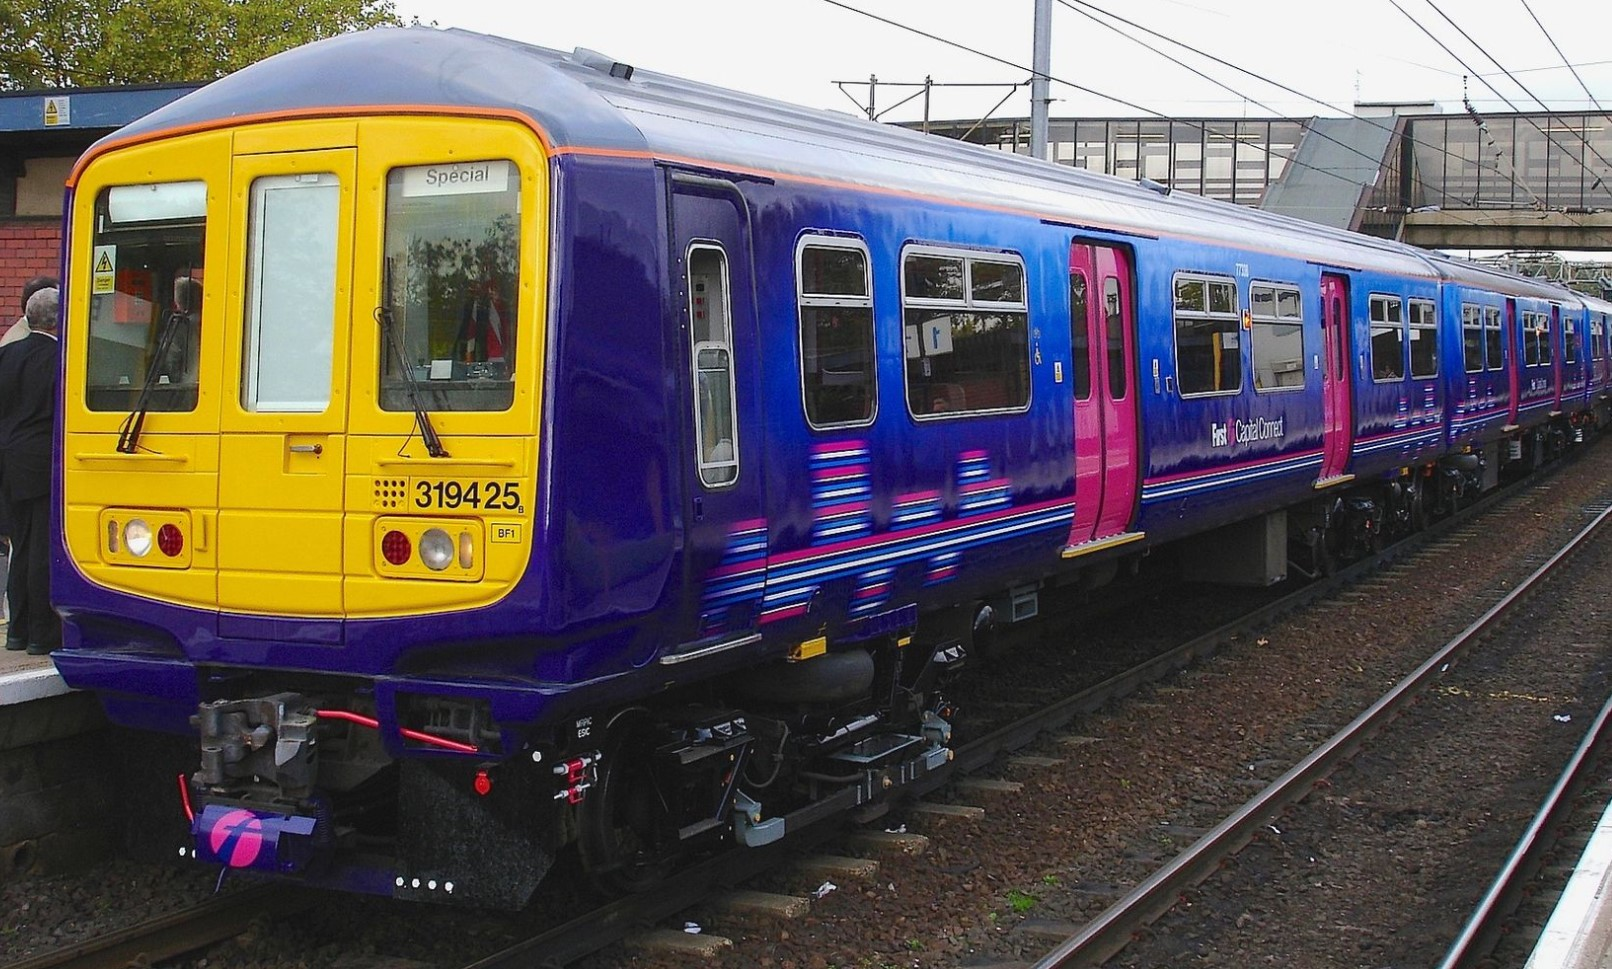 319425 at Bedford in October 2006. ©Peter Skuce